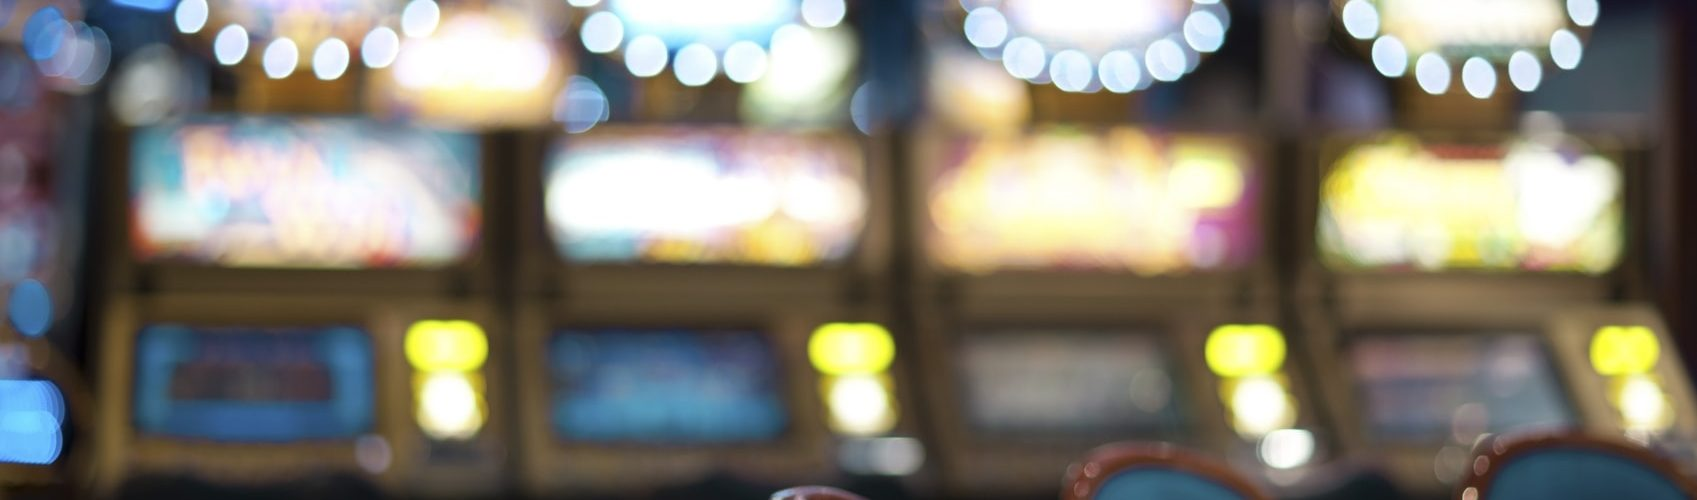 gambling games on roblox